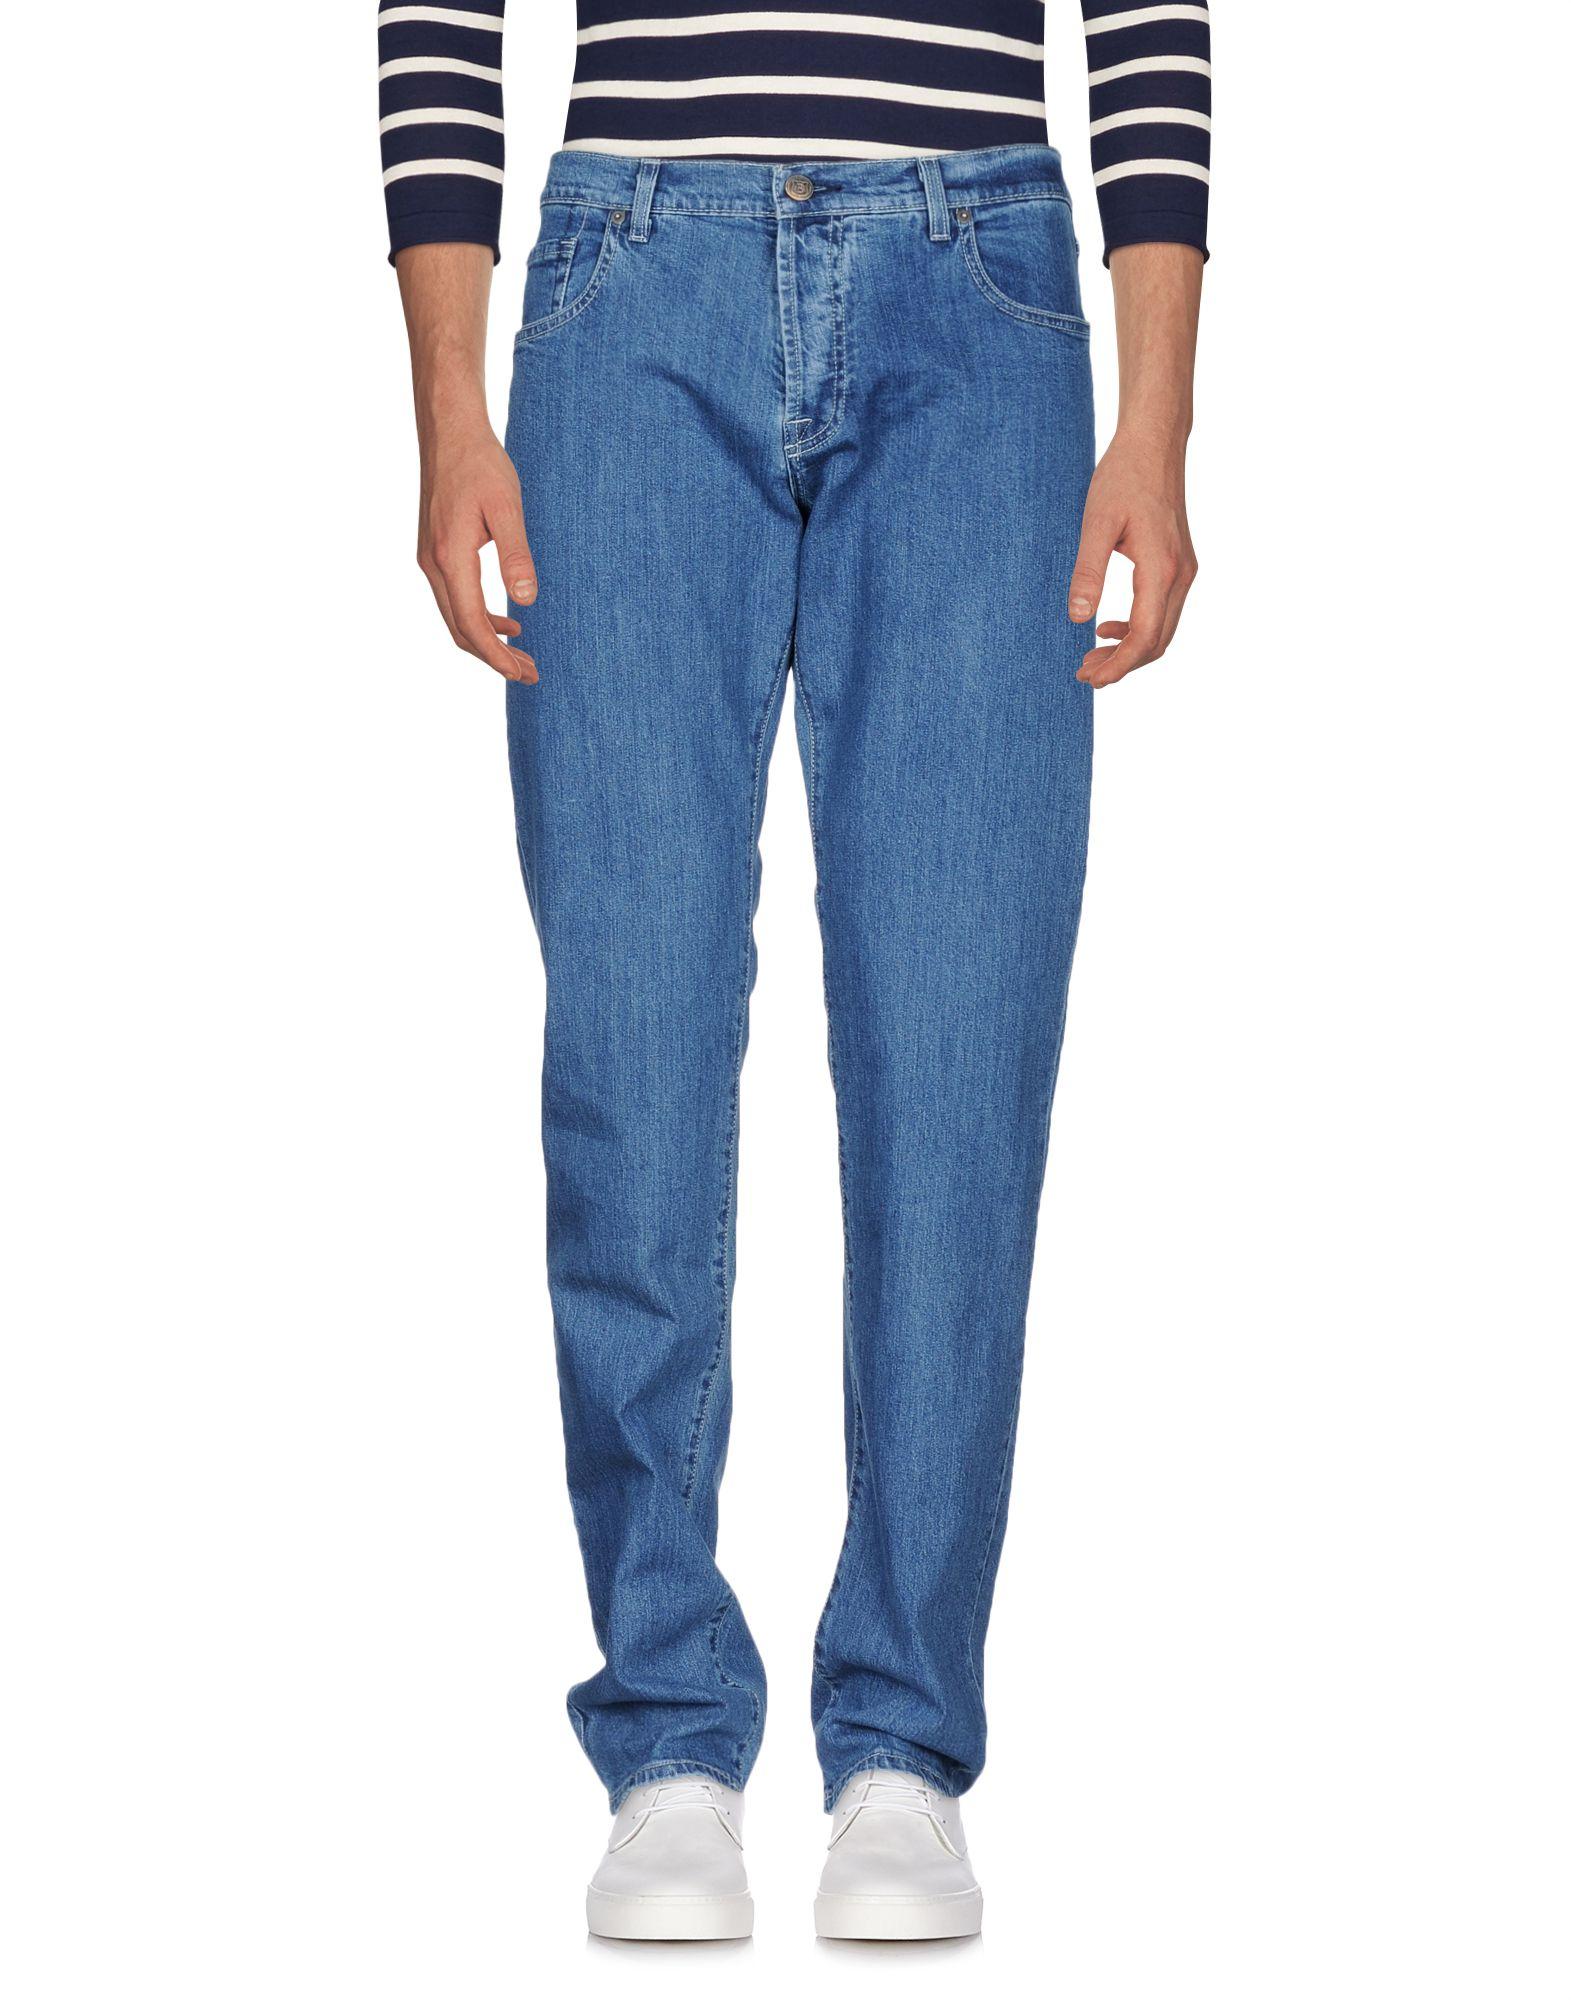 BREUER Denim Pants in Blue